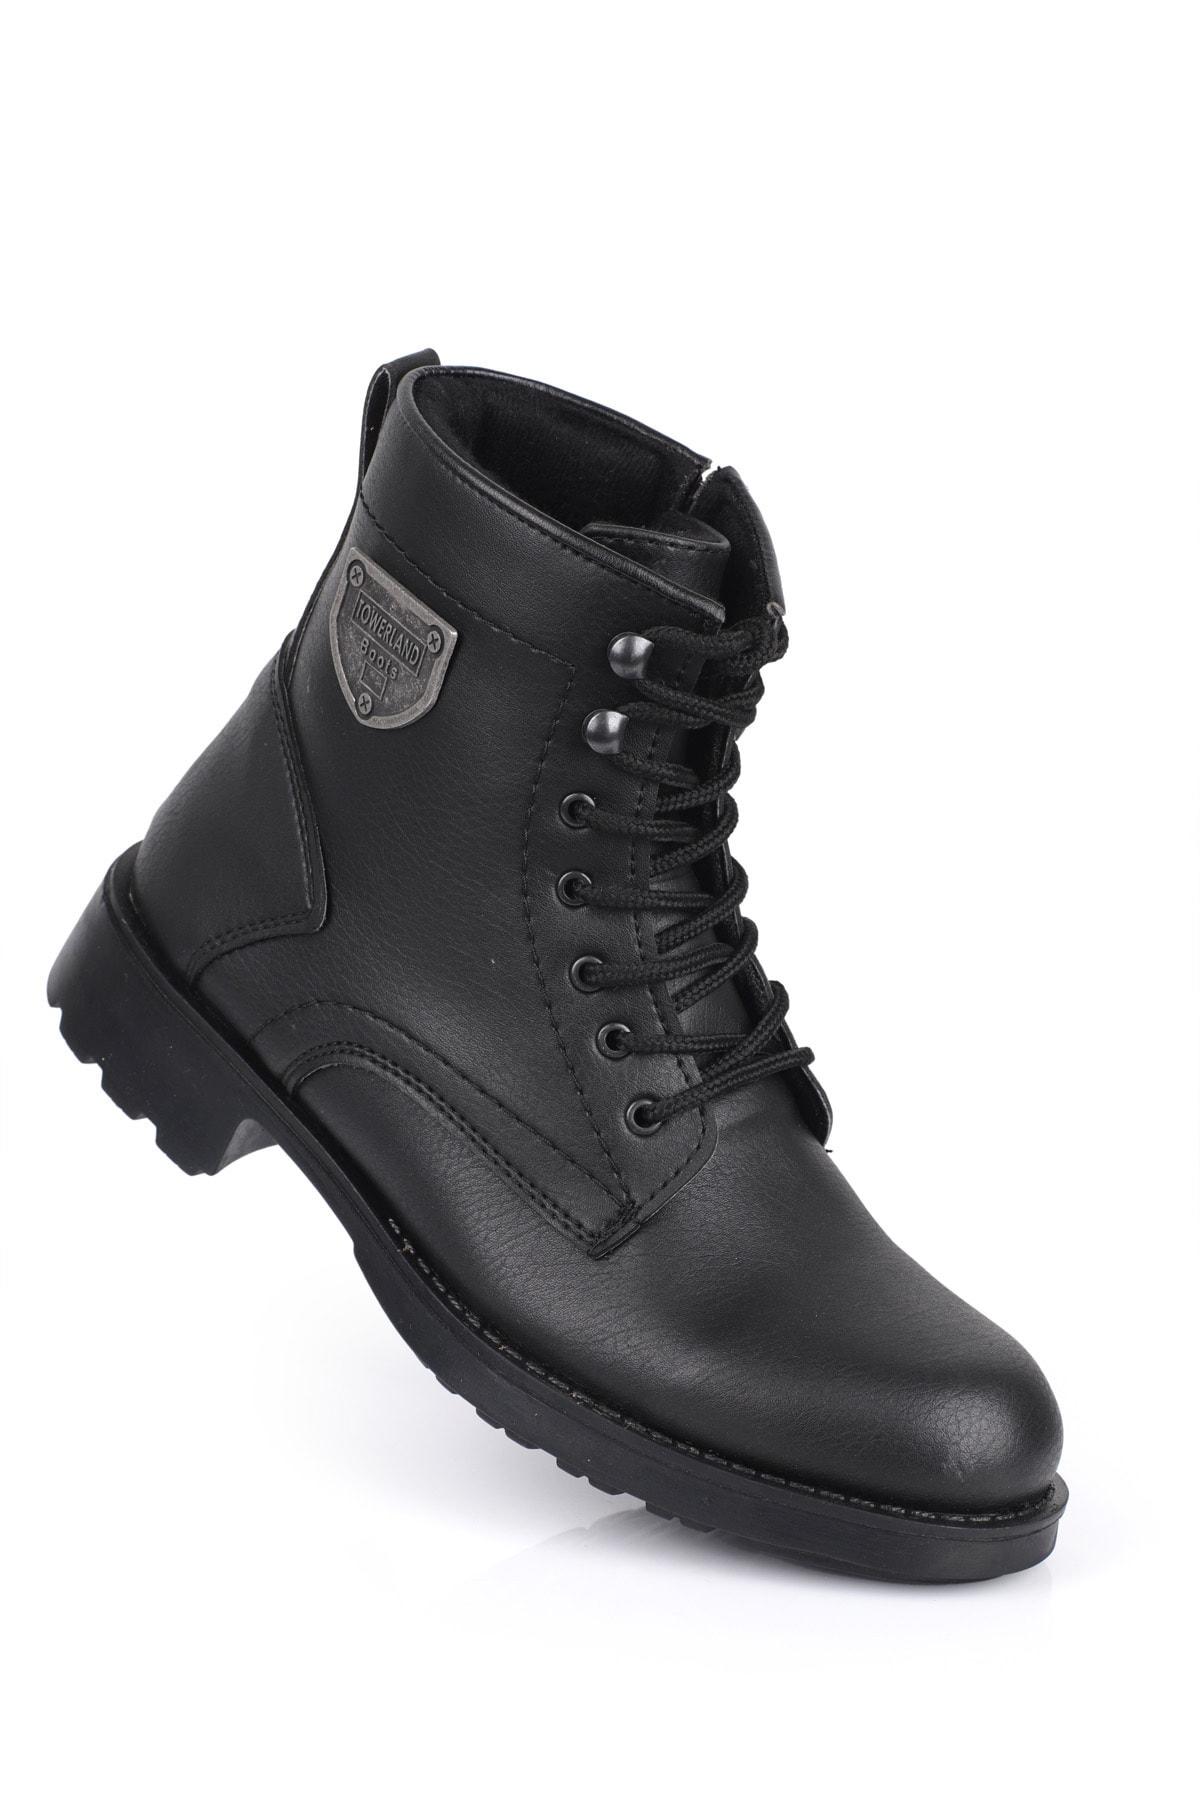 Daxtors Erkek Siyah Kışlık Kar Botu D00655 1